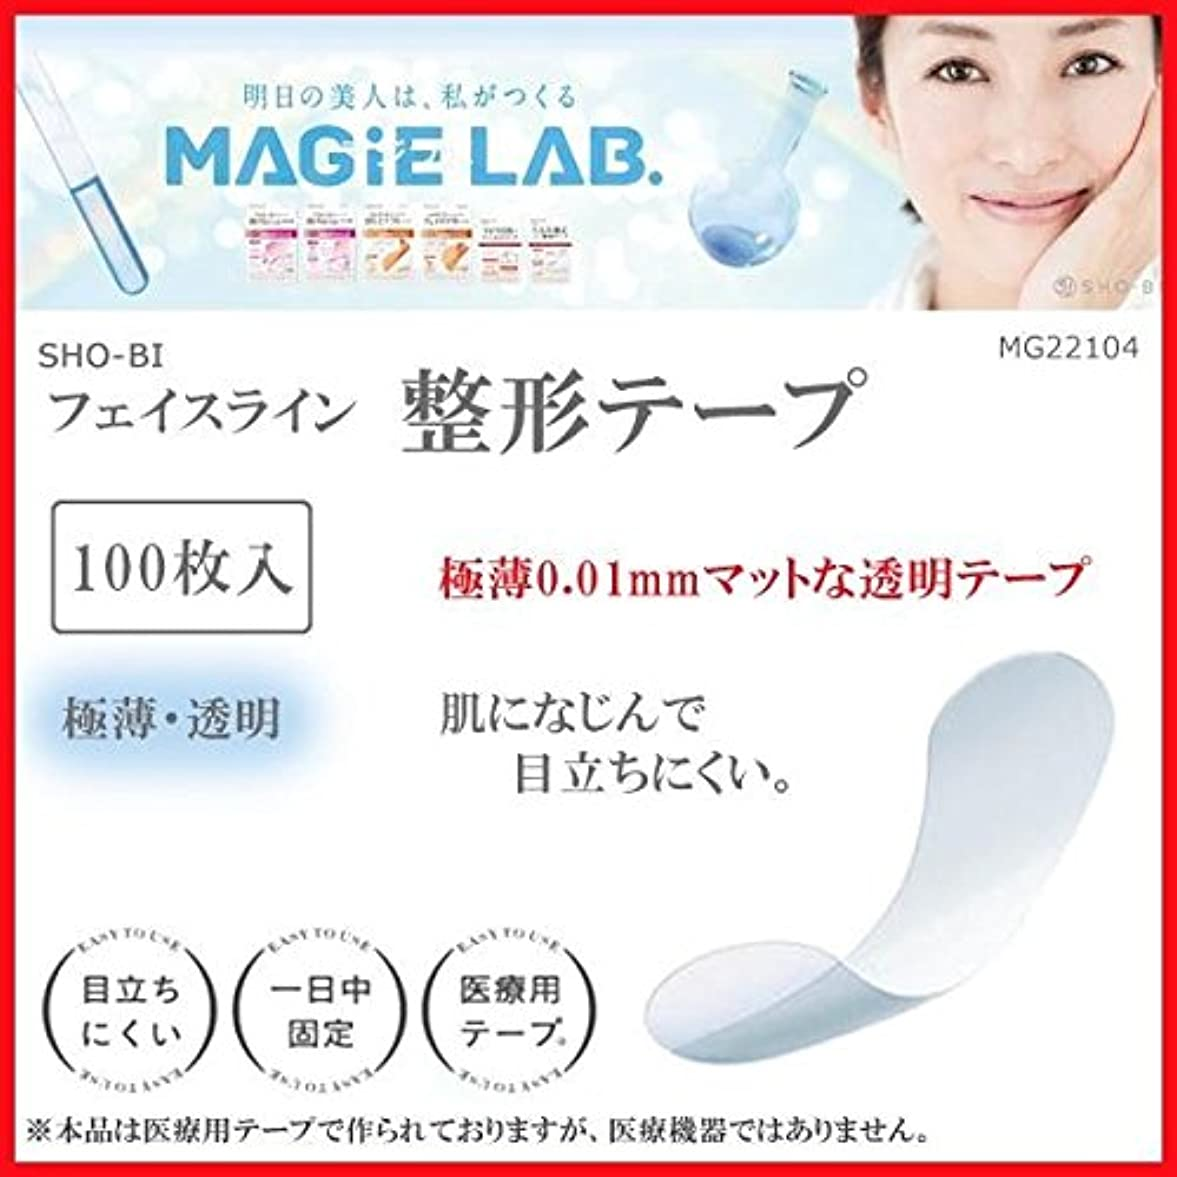 SHO-BI MAGiE LAB.(マジラボ) フェイスライン整形テープ 100枚入 MG22104